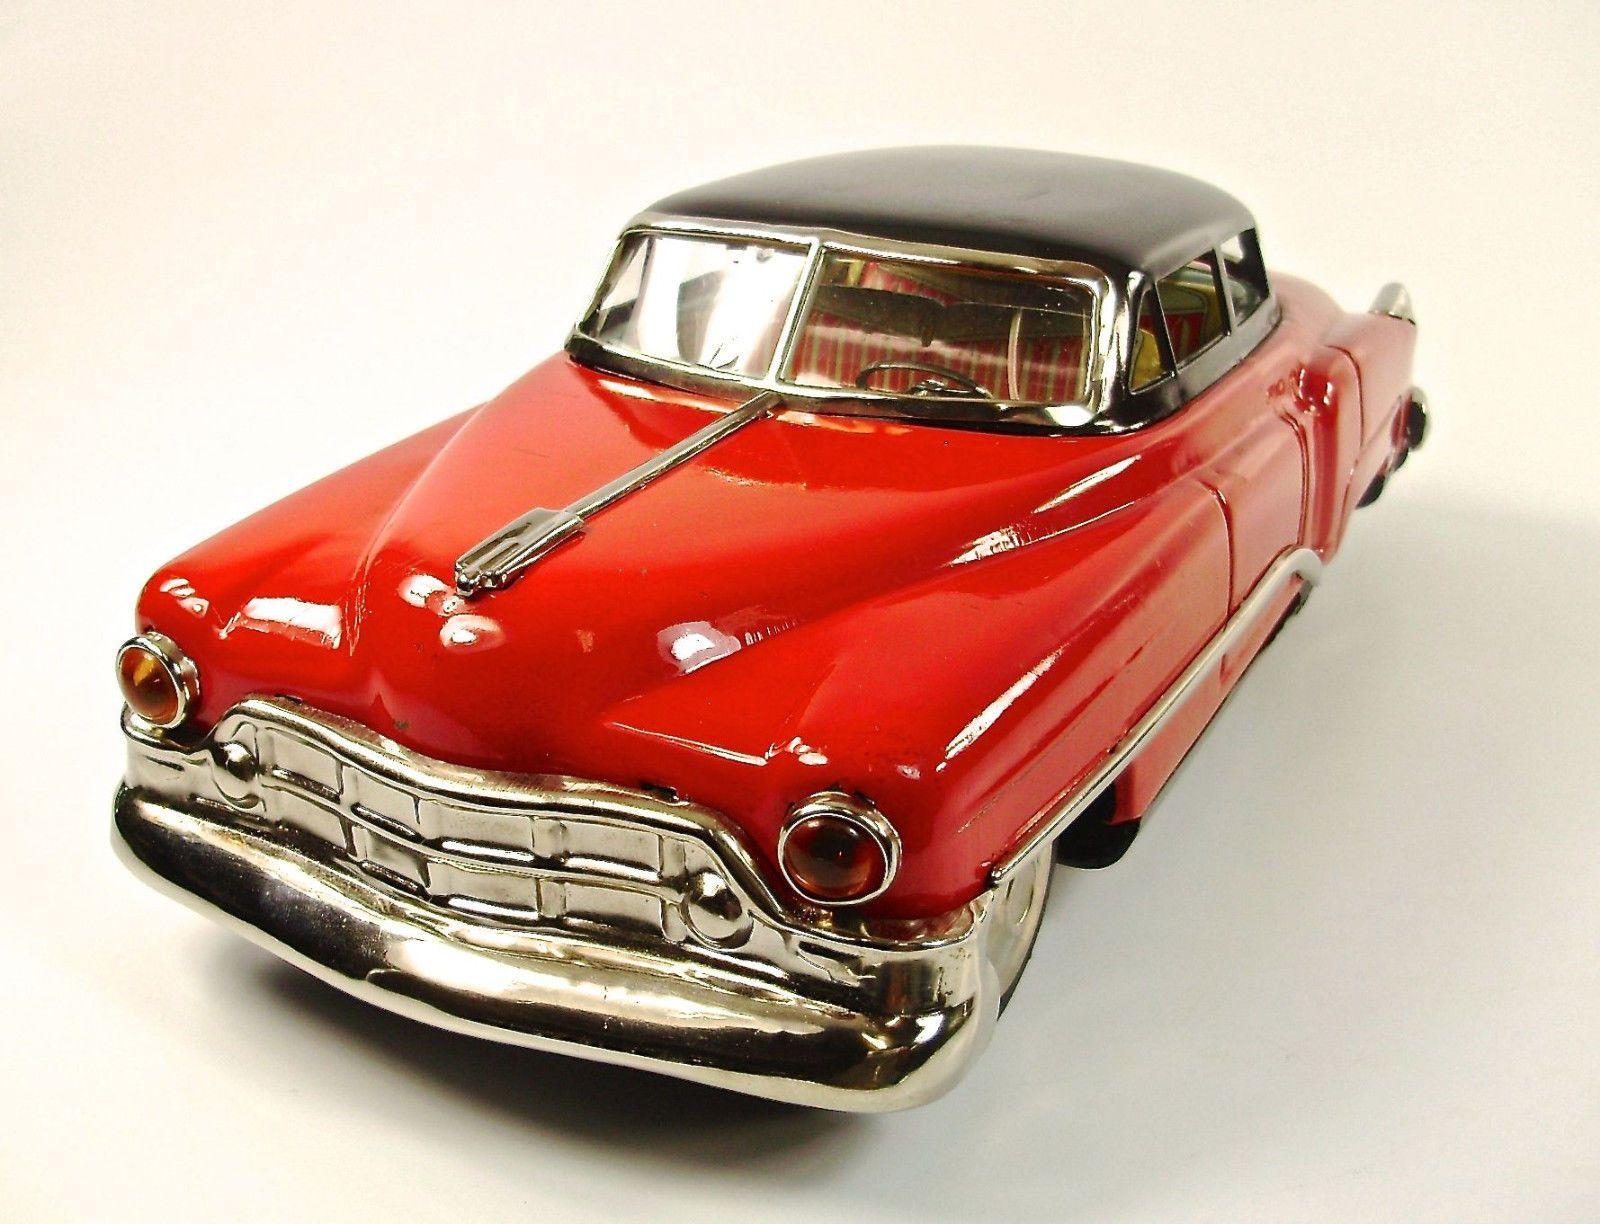 "1949 Cadillac 4 Door Sedan 13 5"" Japanese Tin Car by TN Toy Nomura"